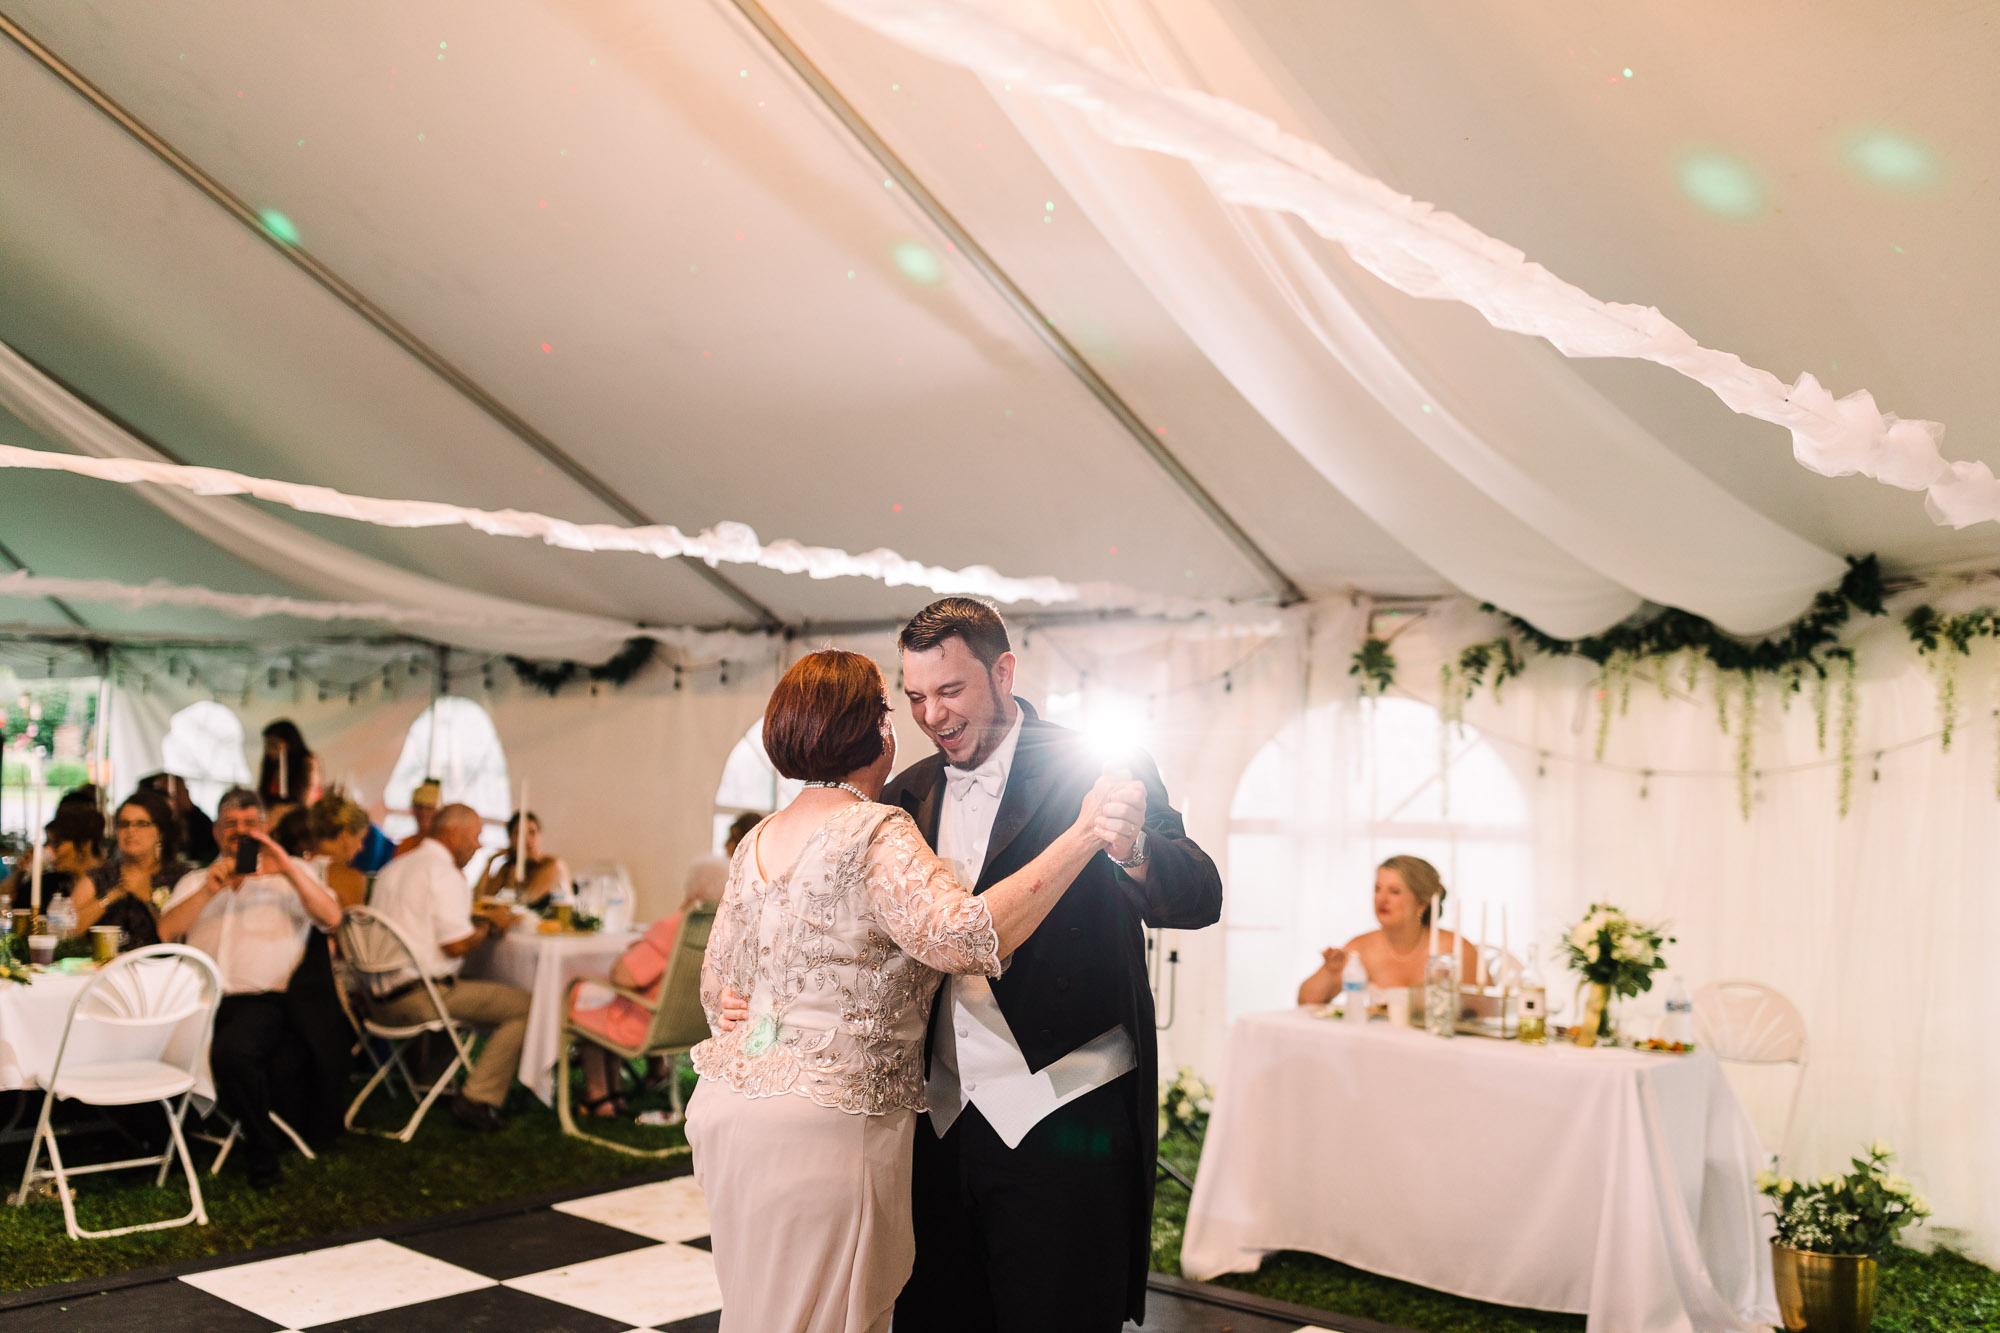 isle-of-que-wedding-7305.jpg